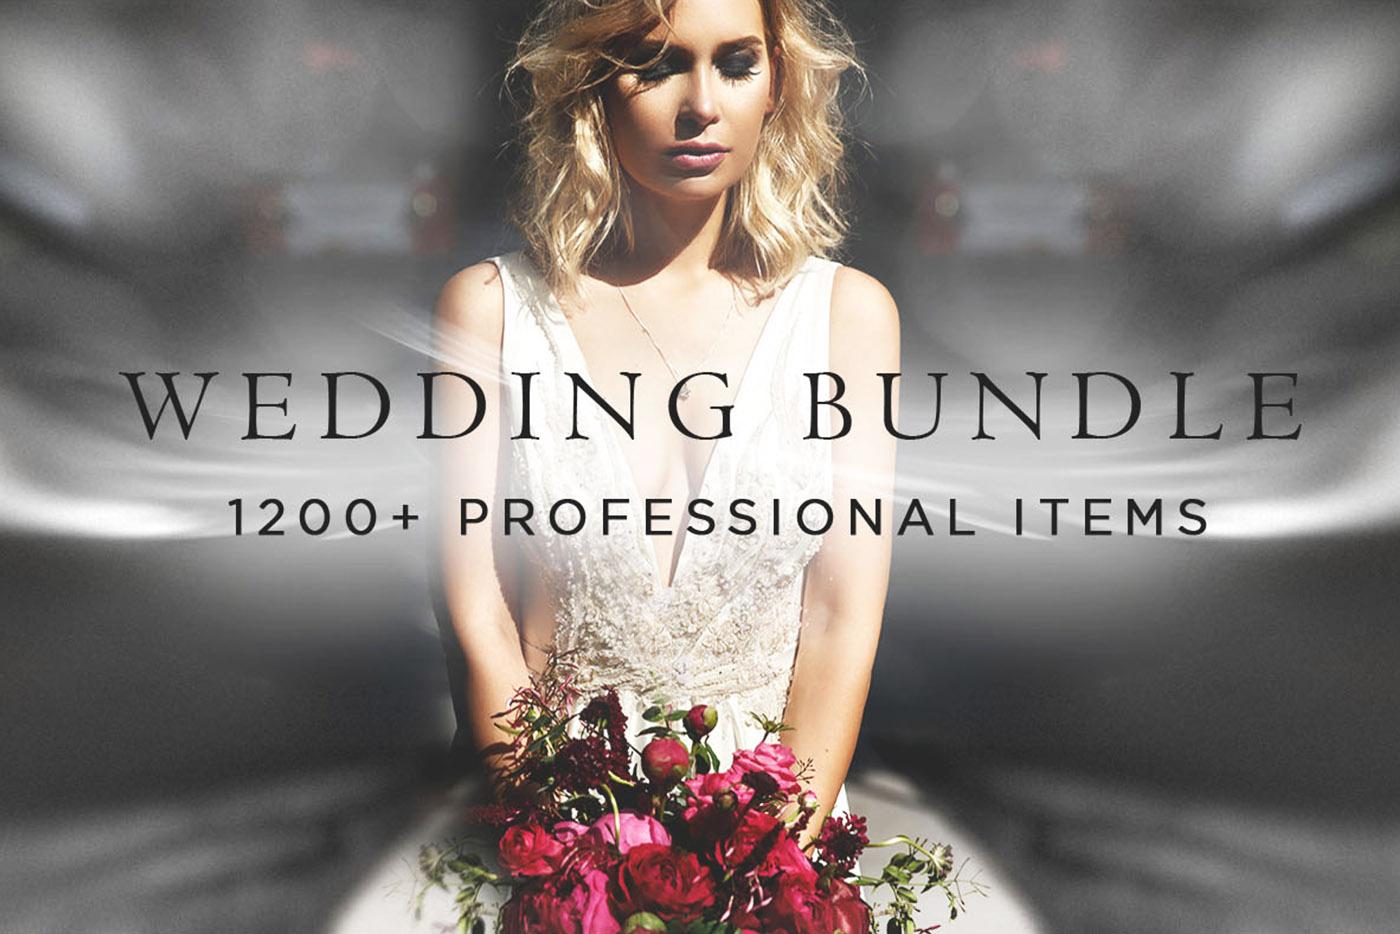 1200+ Wedding Bundle PS   LR items - NEW AVATAR CM -